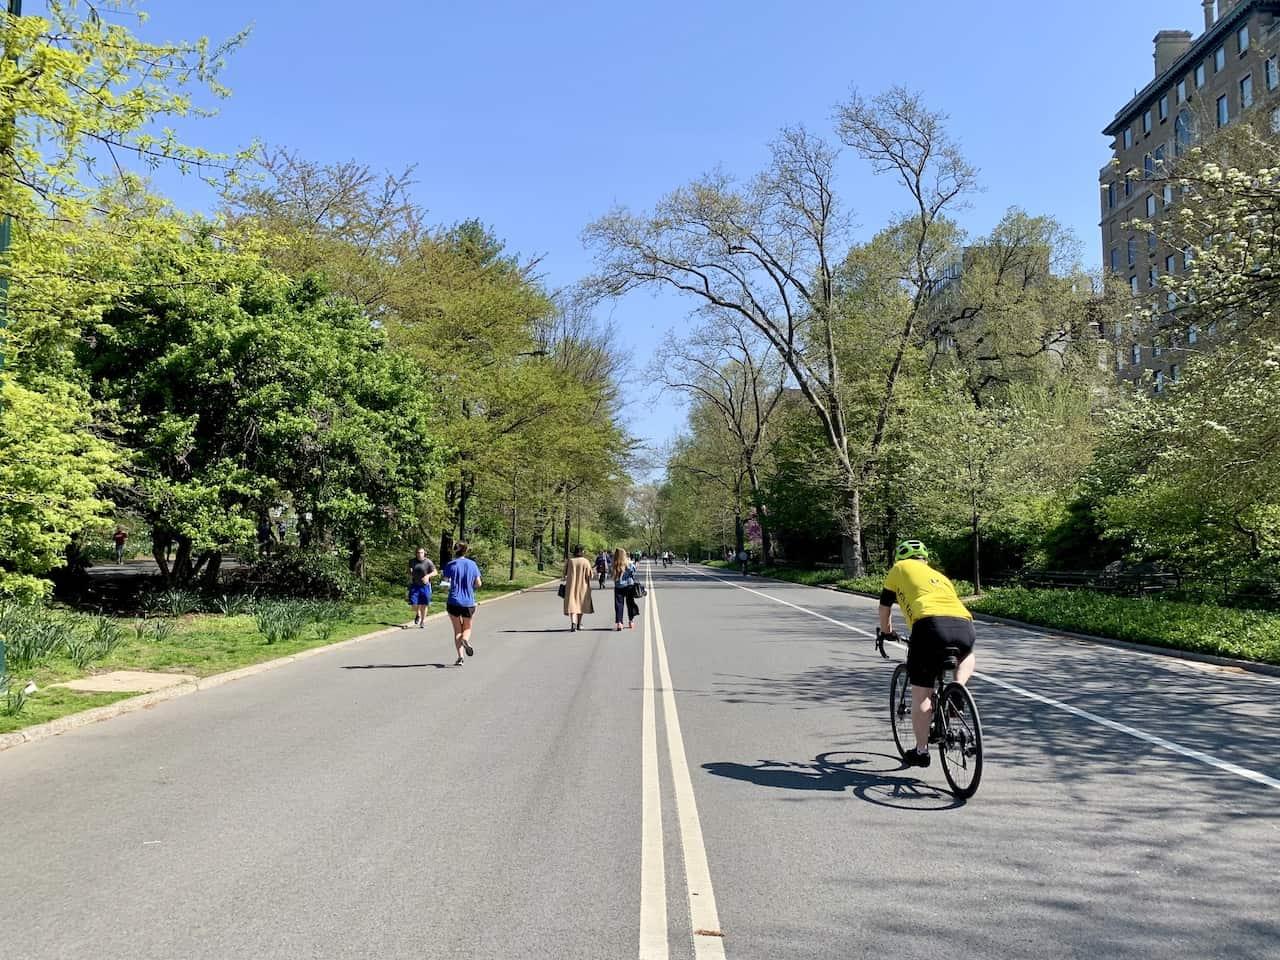 East Drive Central Park